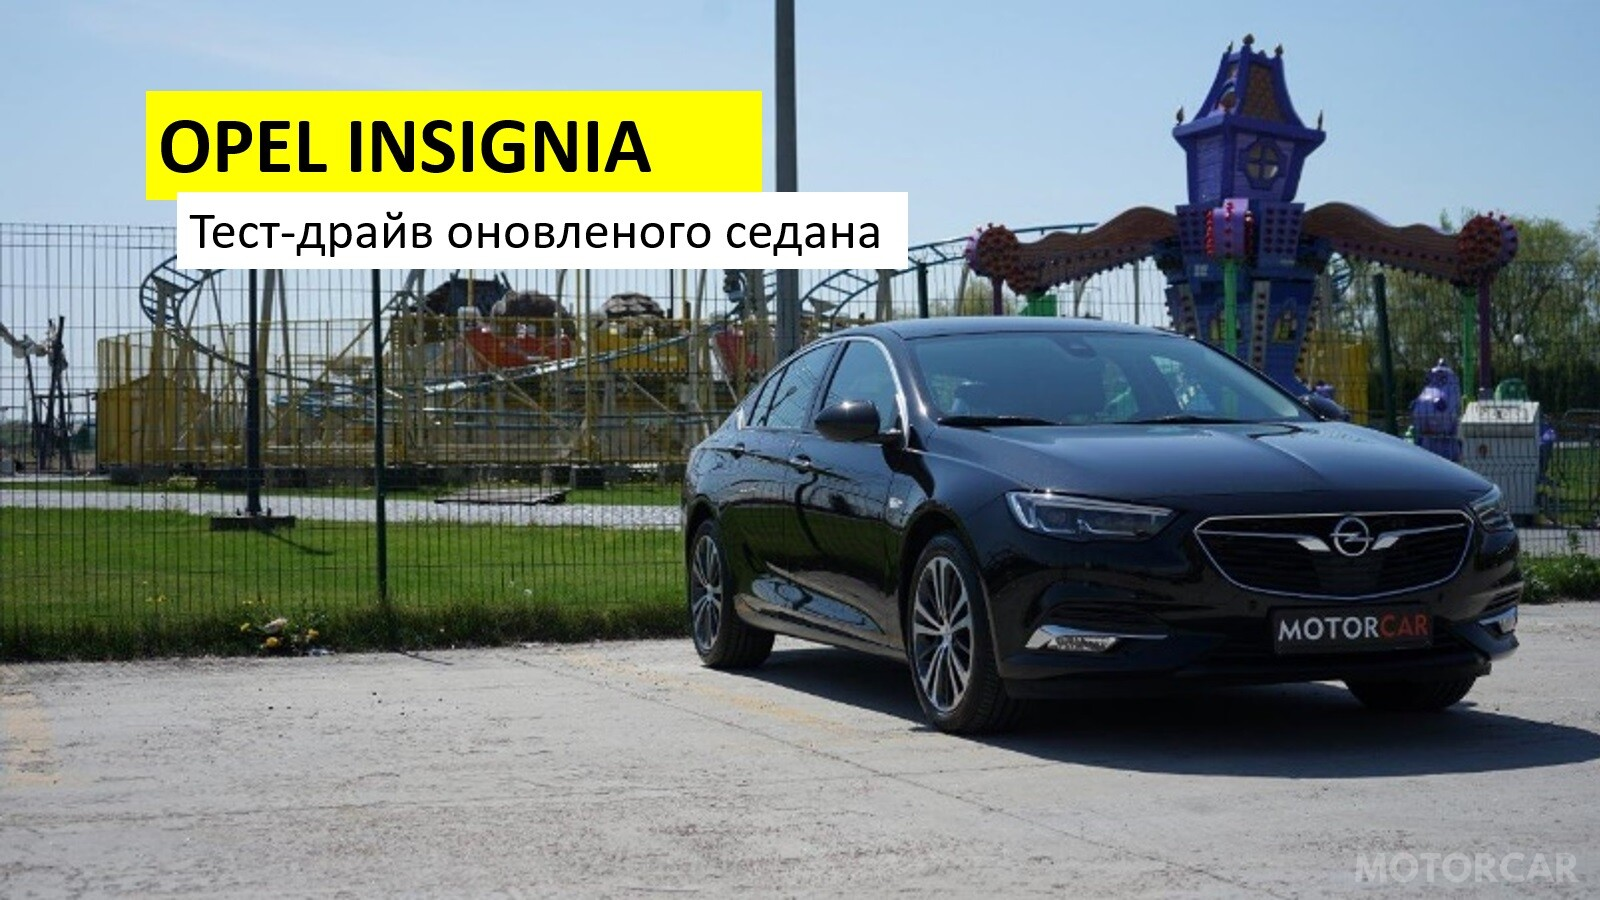 Opel Insignia тест-драйв огляд